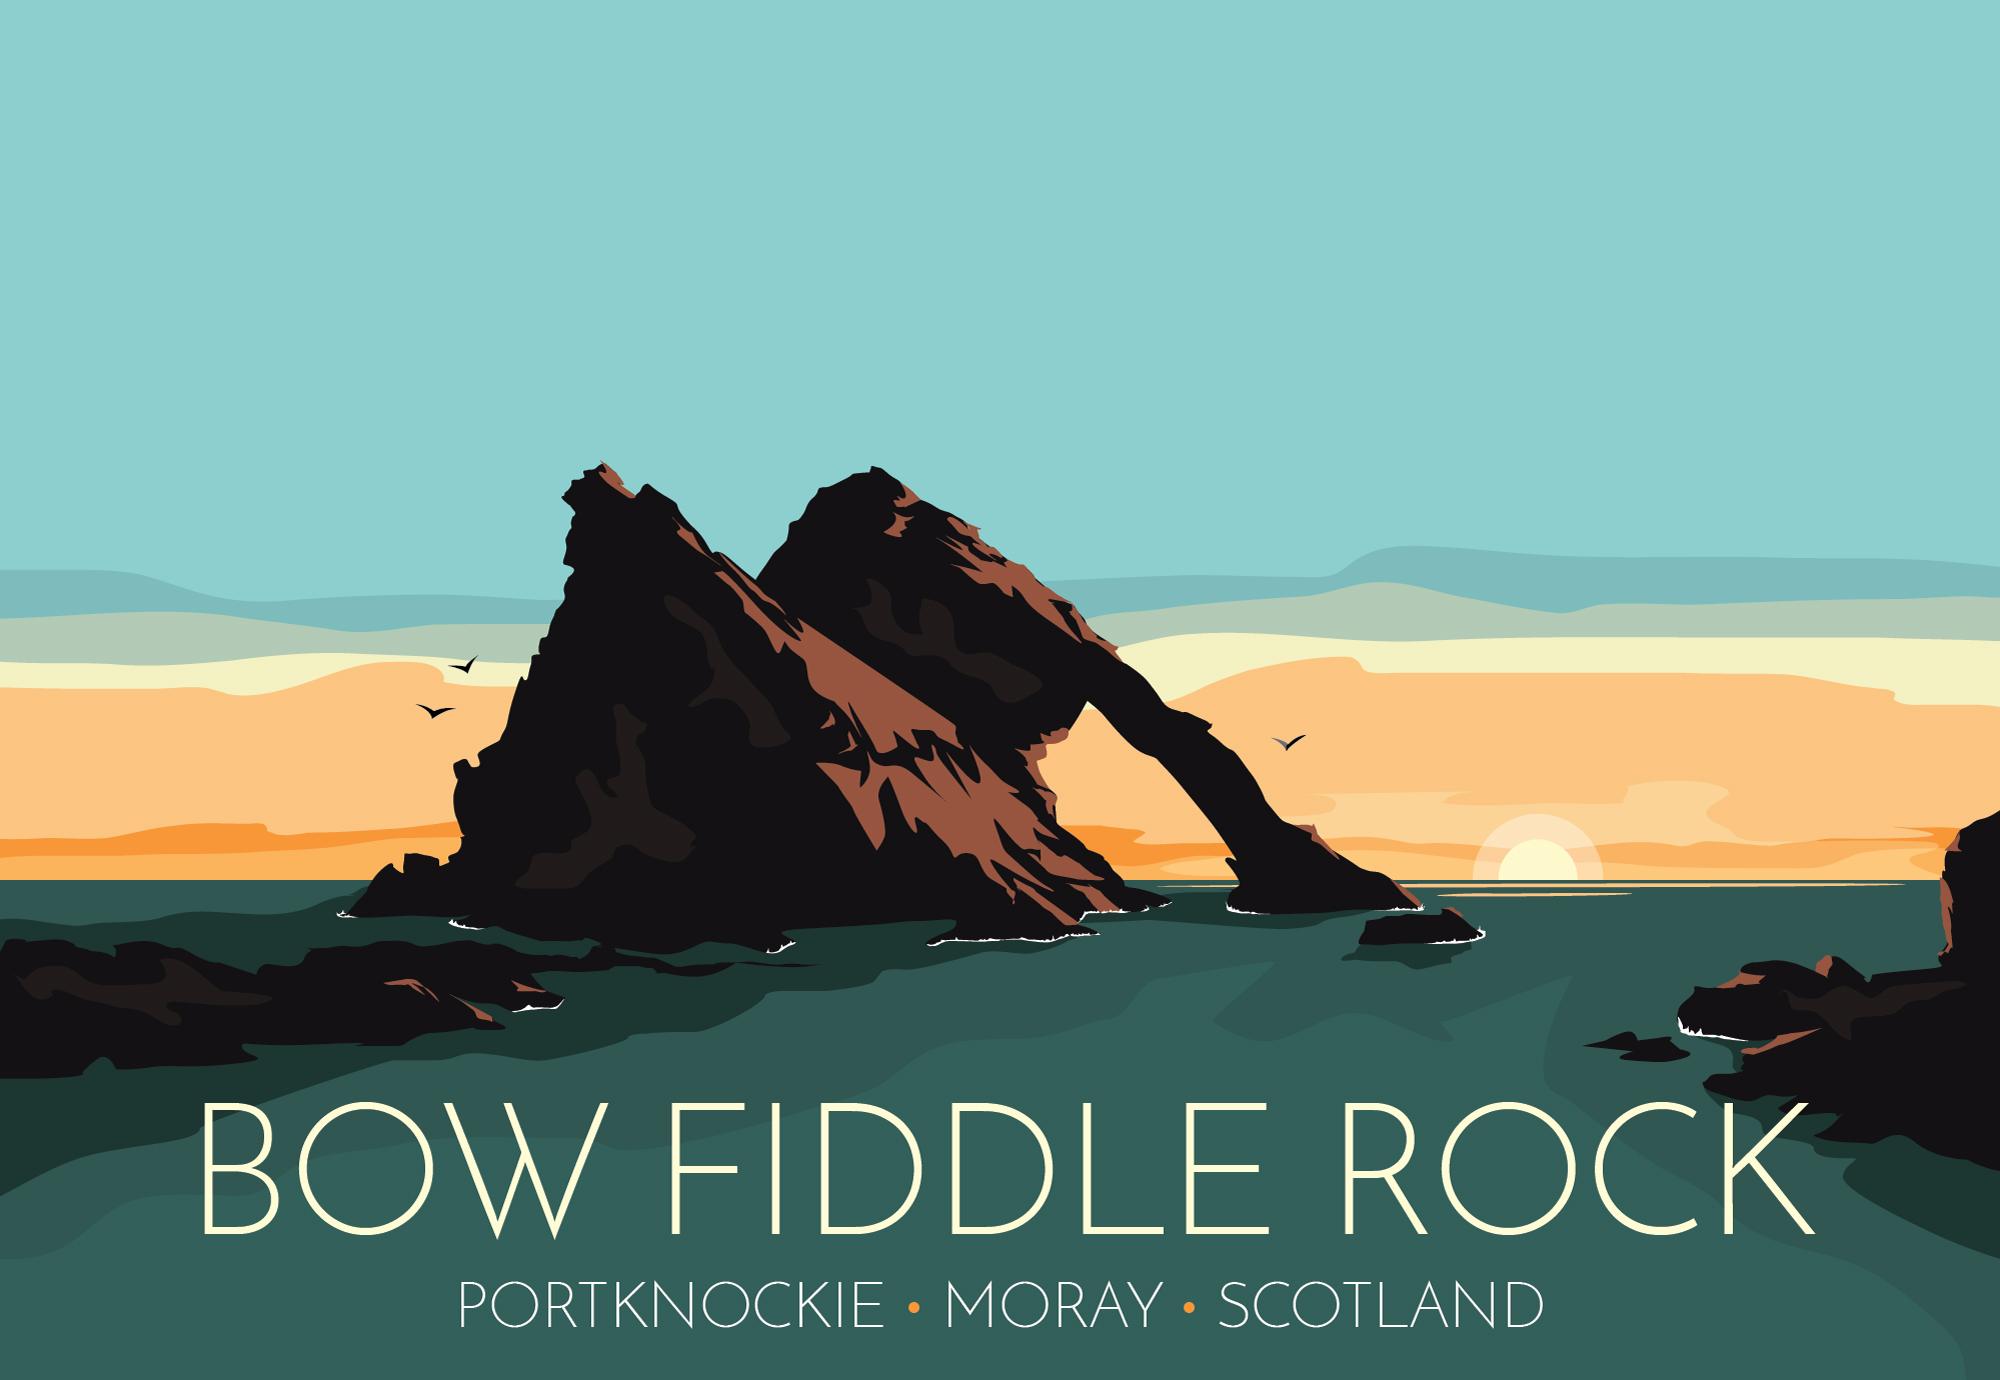 bowfiddlerock_a3_2000_no-frame